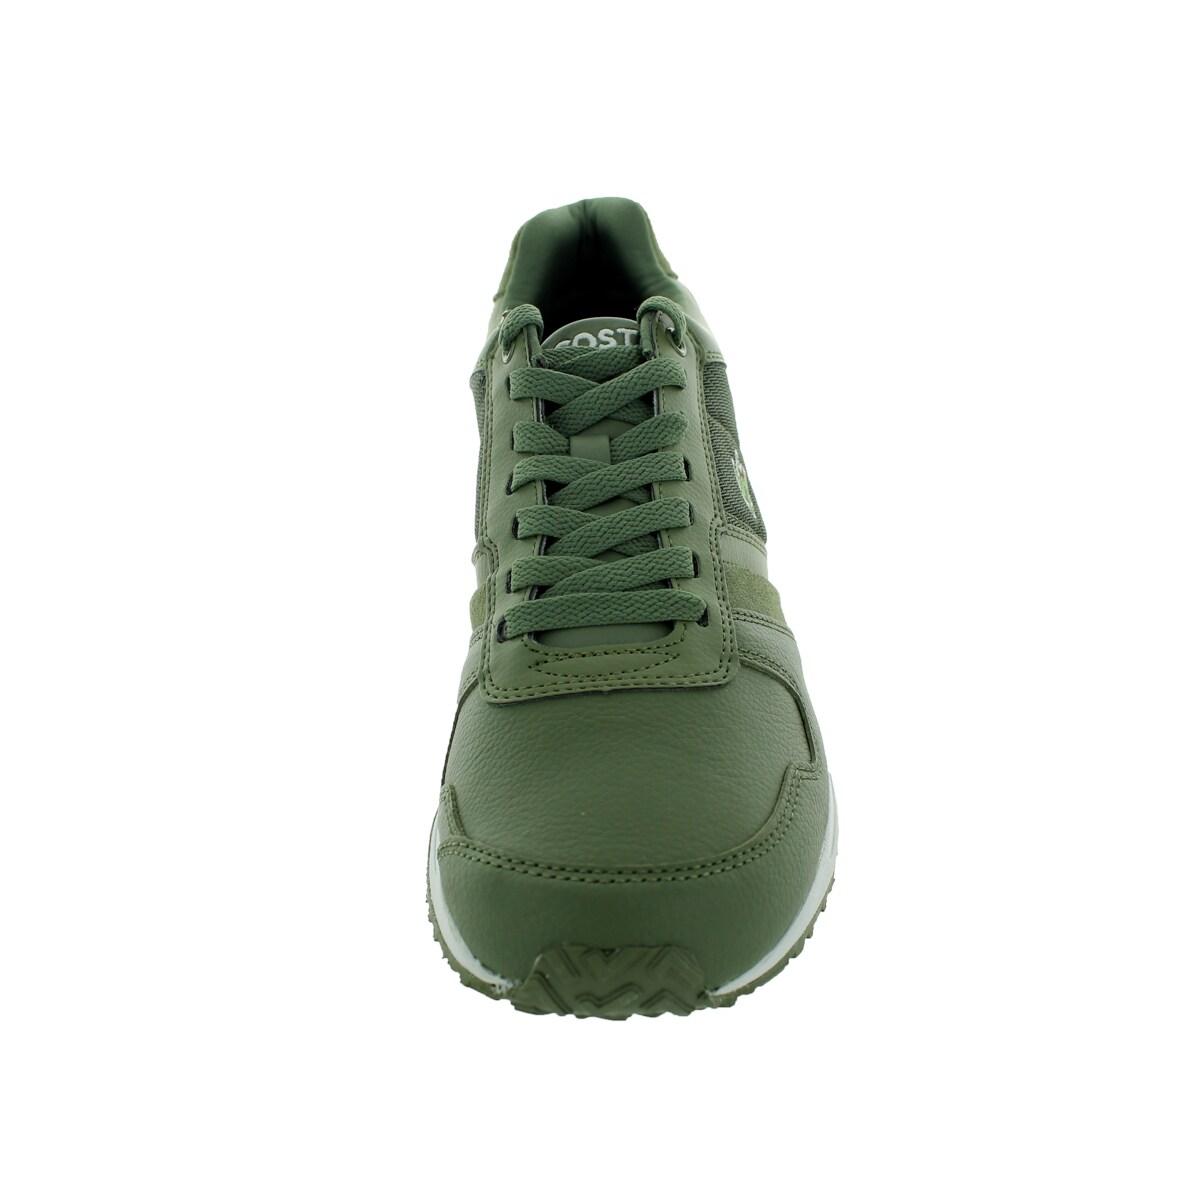 3aac2bdf5ccfe Shop Lacoste Men s Vauban Twd Spm Khk Khk Casual Shoe - Free Shipping Today  - Overstock.com - 12330658